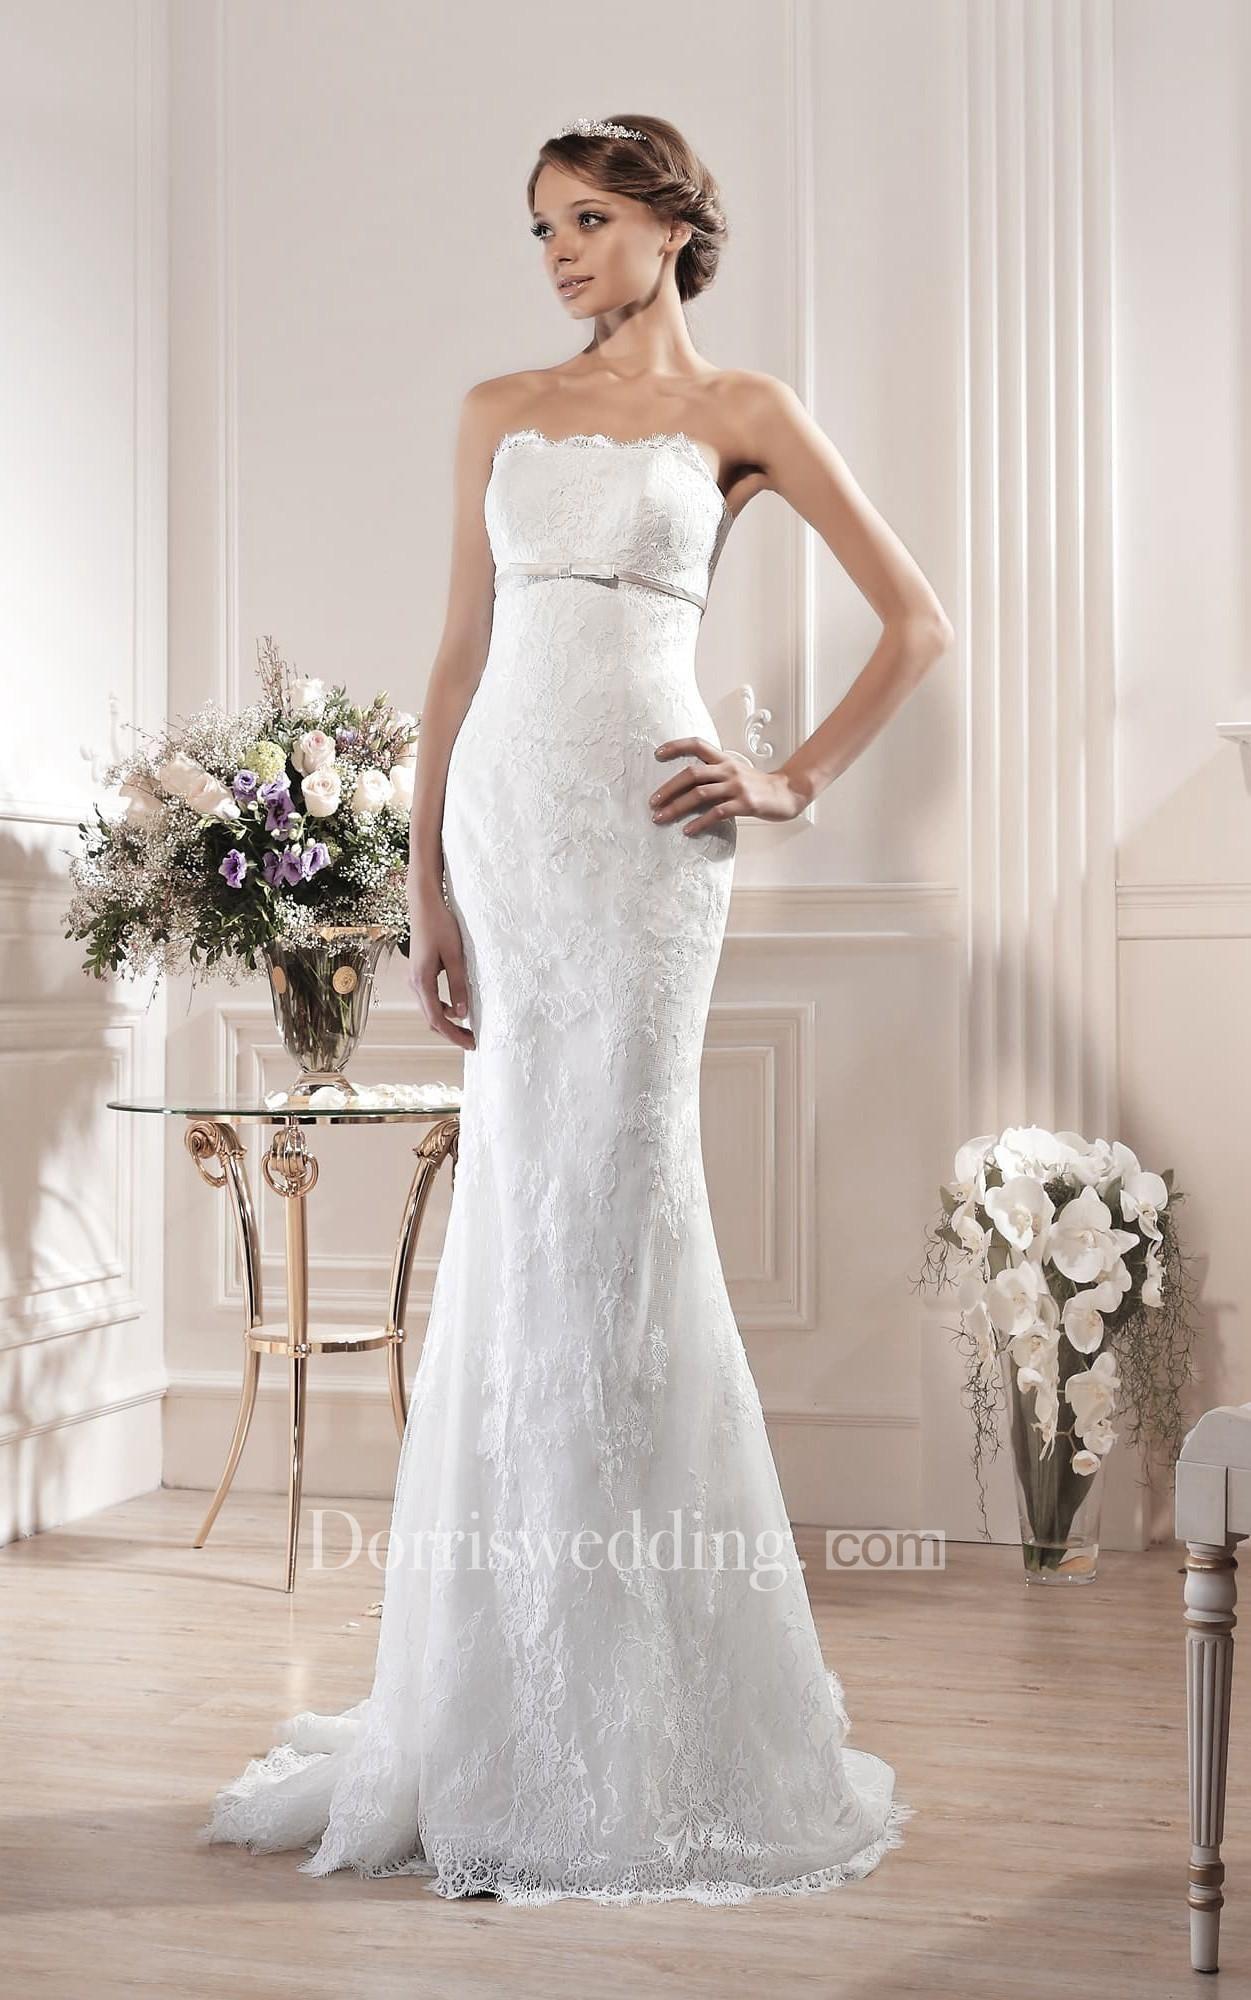 Dorris wedding dorris wedding sheath long strapless sleeveless